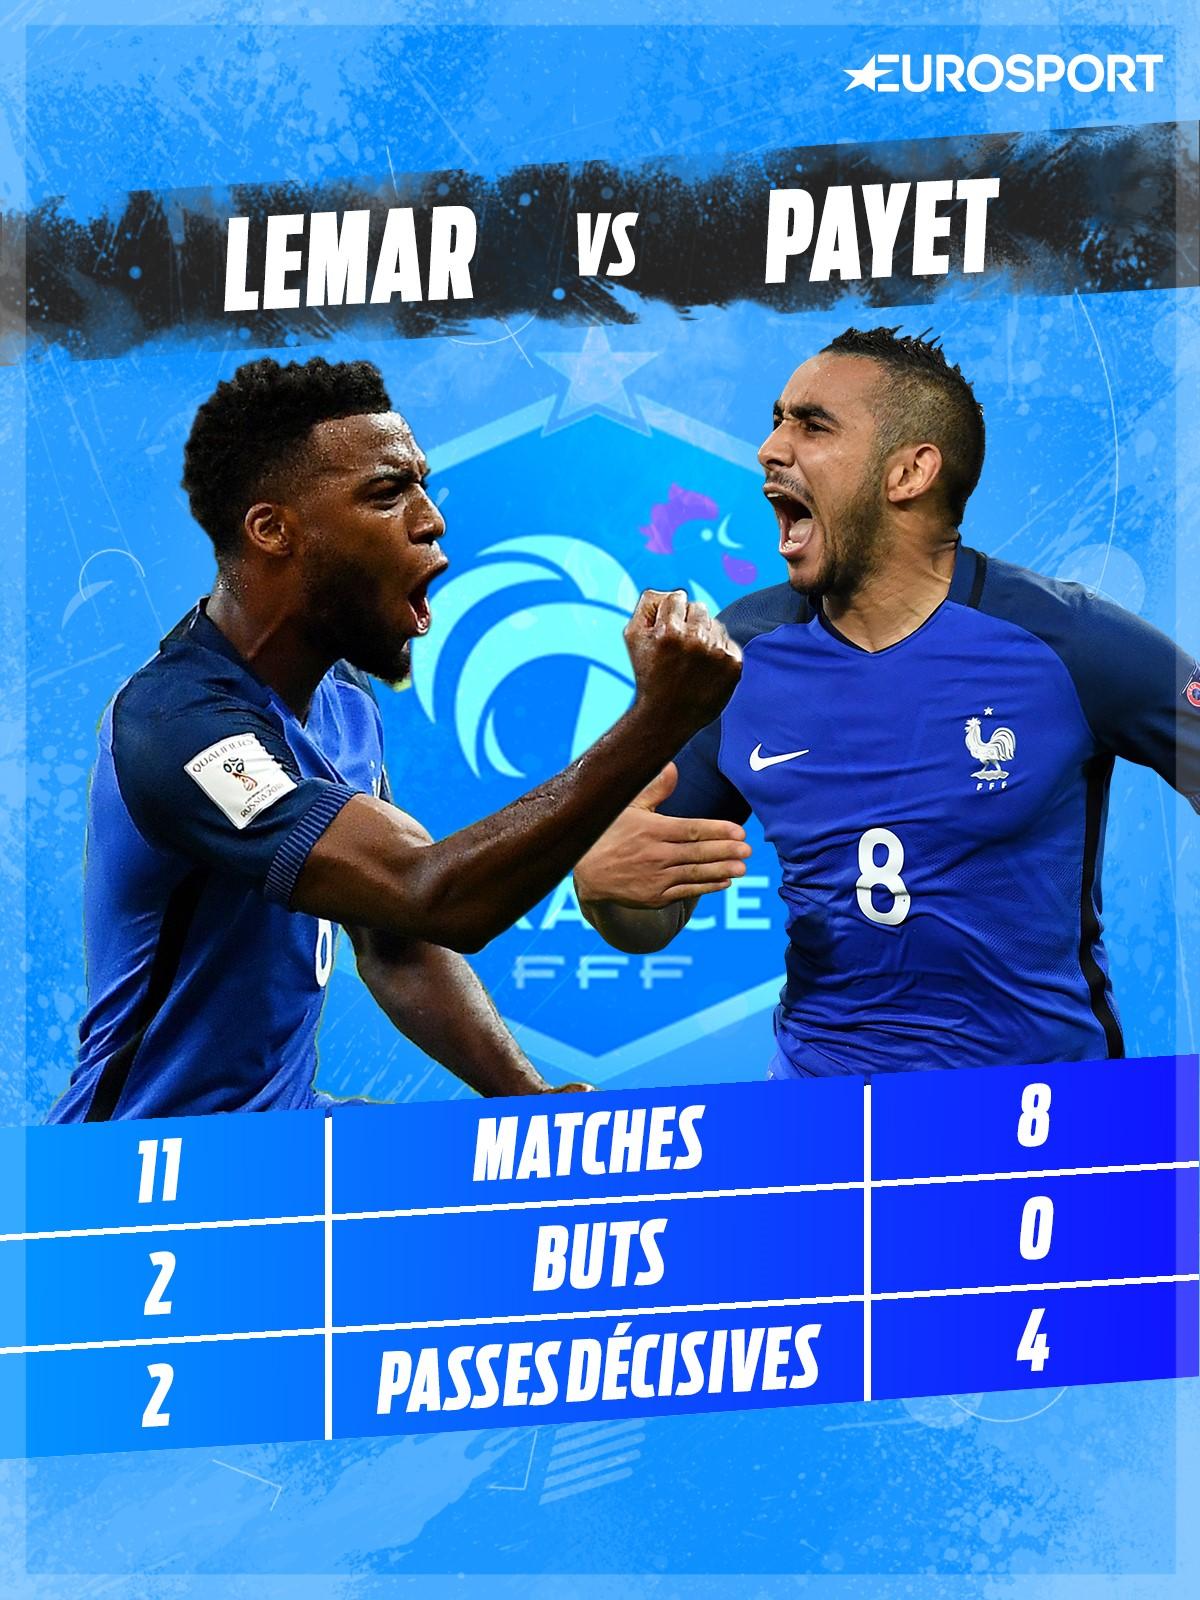 Lemar vs Payet